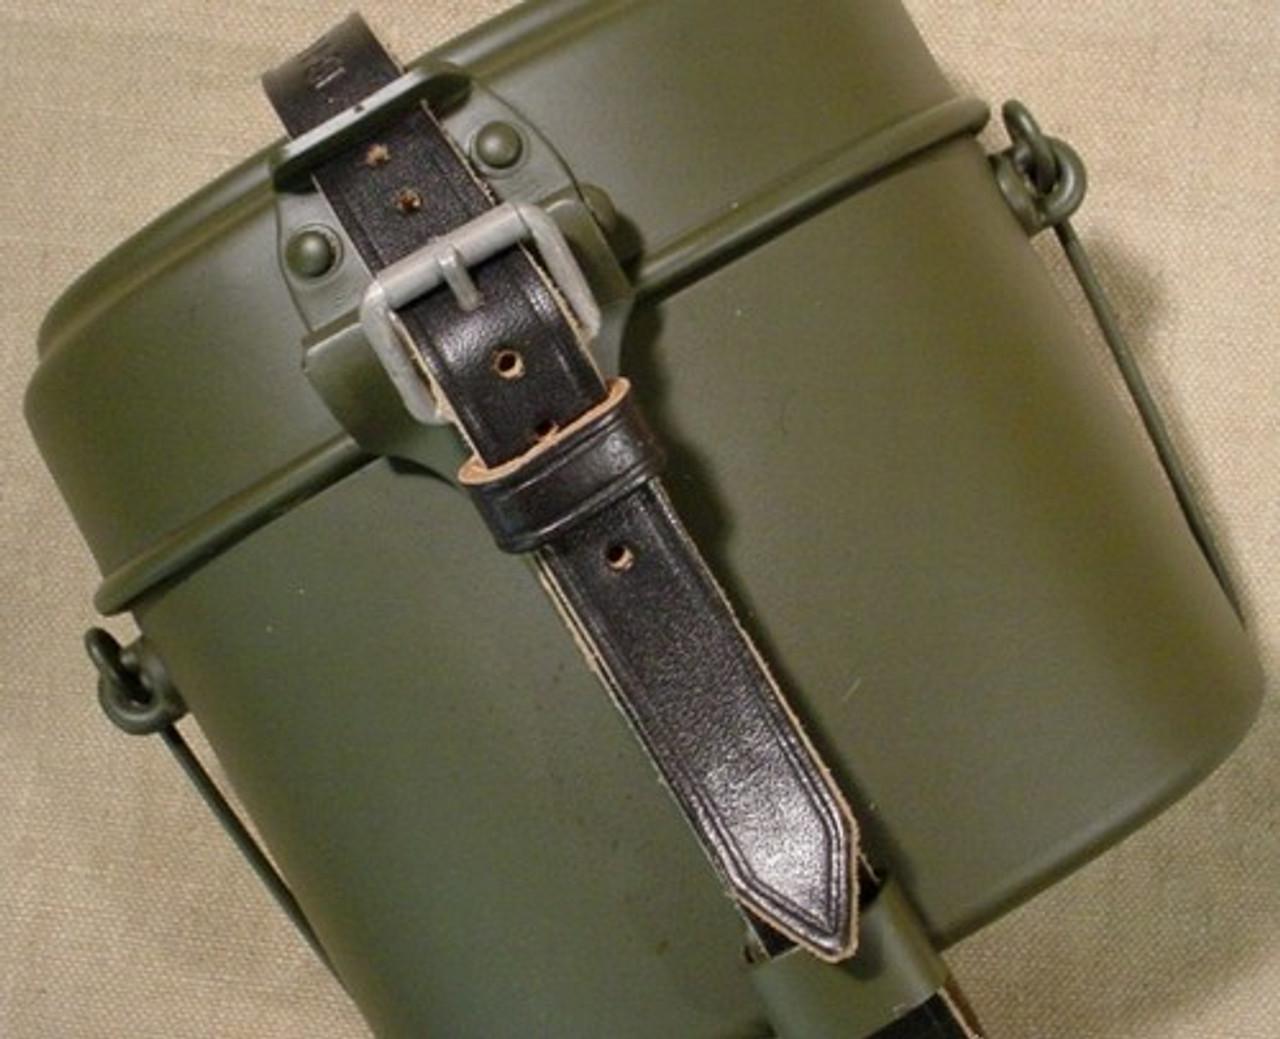 German Mess Kit Strap from Hessen Antique